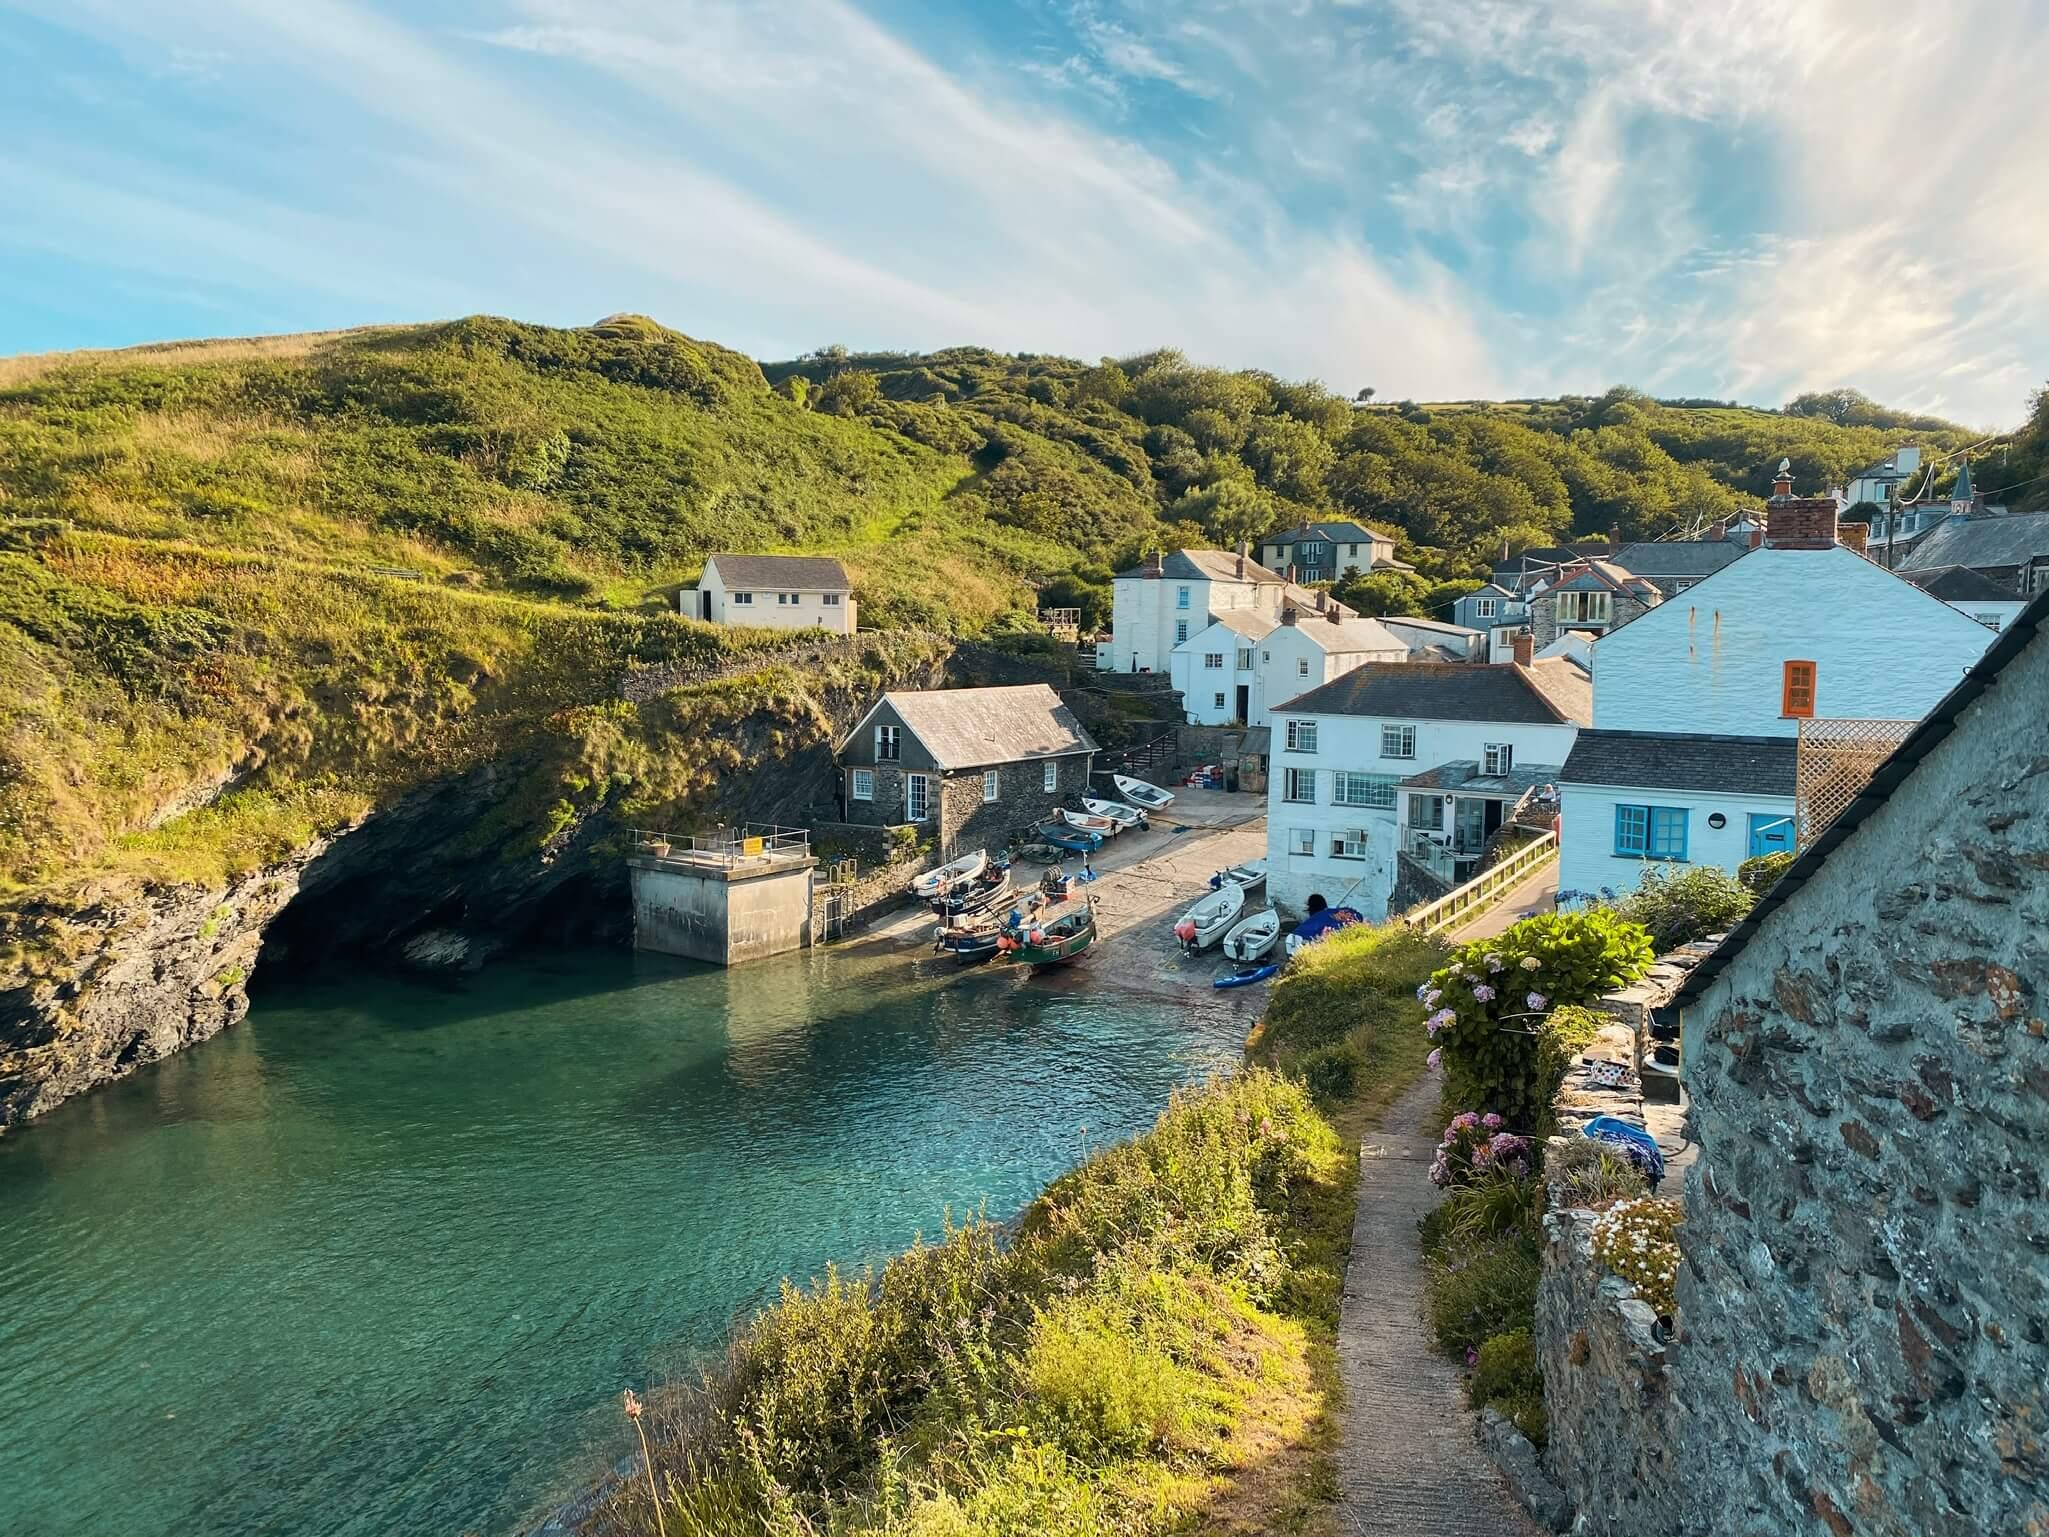 Portloe Cornwall (Where to stay in Cornwall)